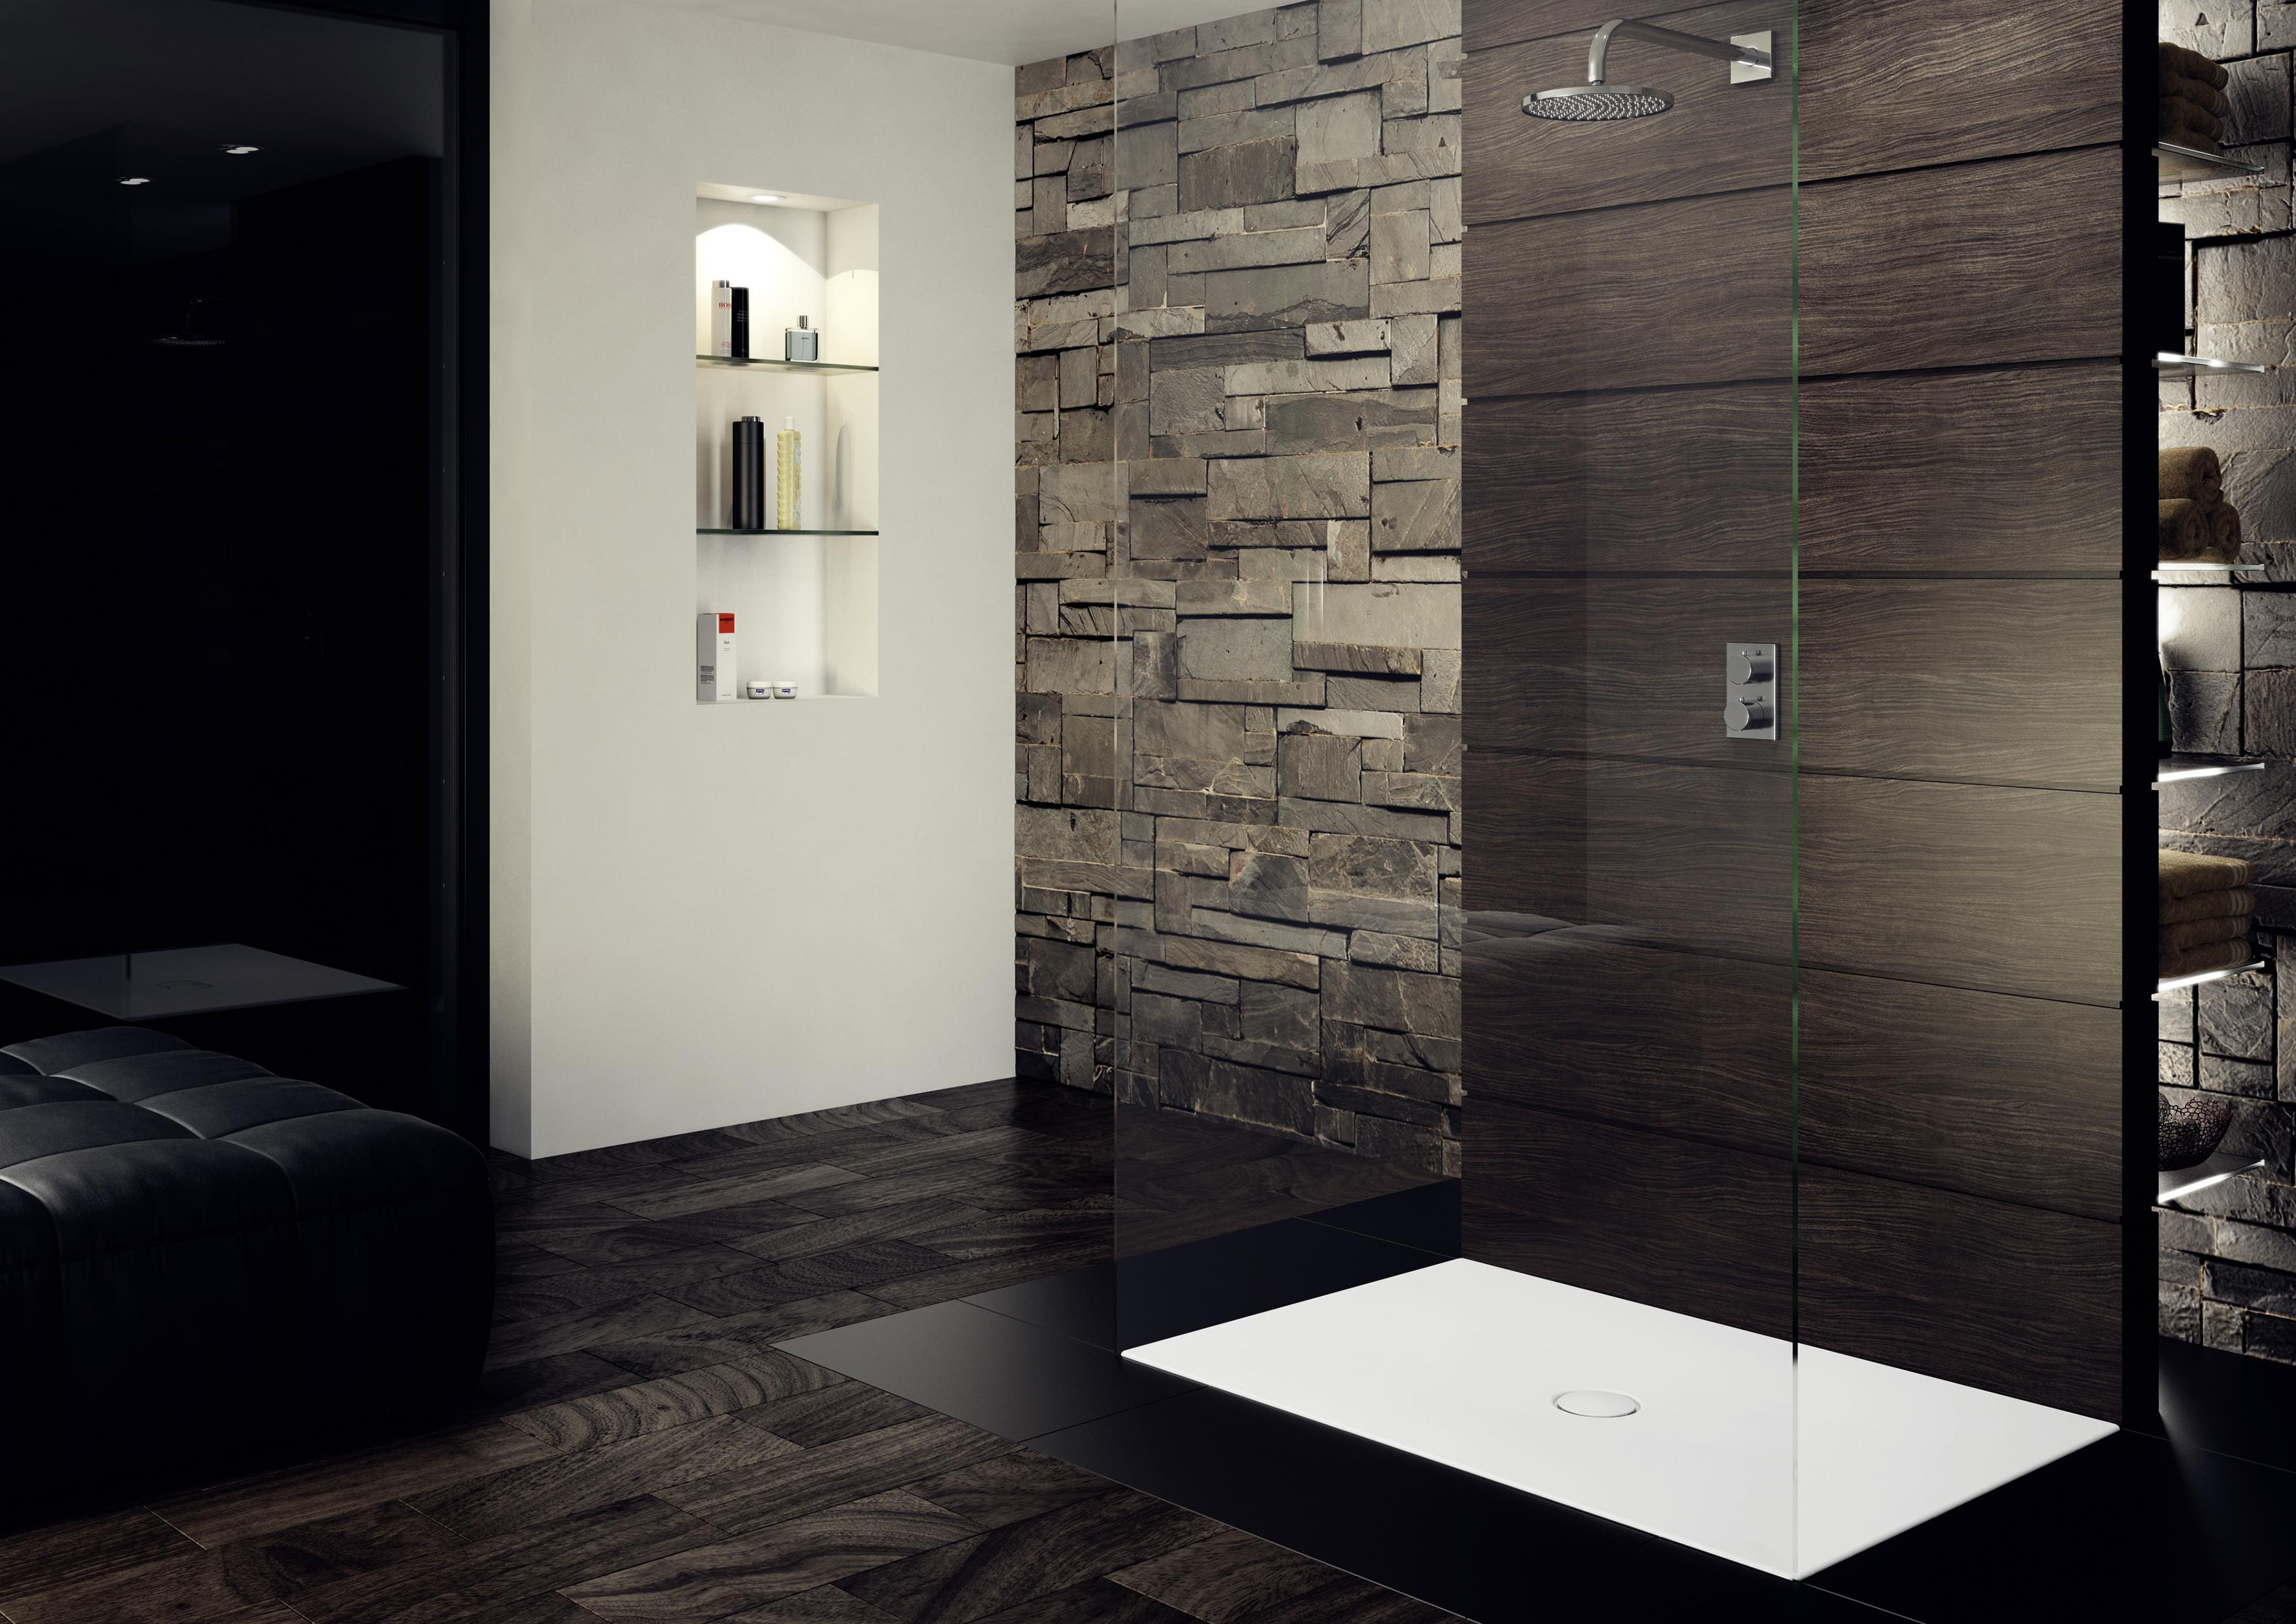 Kaldewei scona di kaldewei moderni piatti doccia per qualsiasi budget iconic bathroom solutions - Integrale badkamer ...